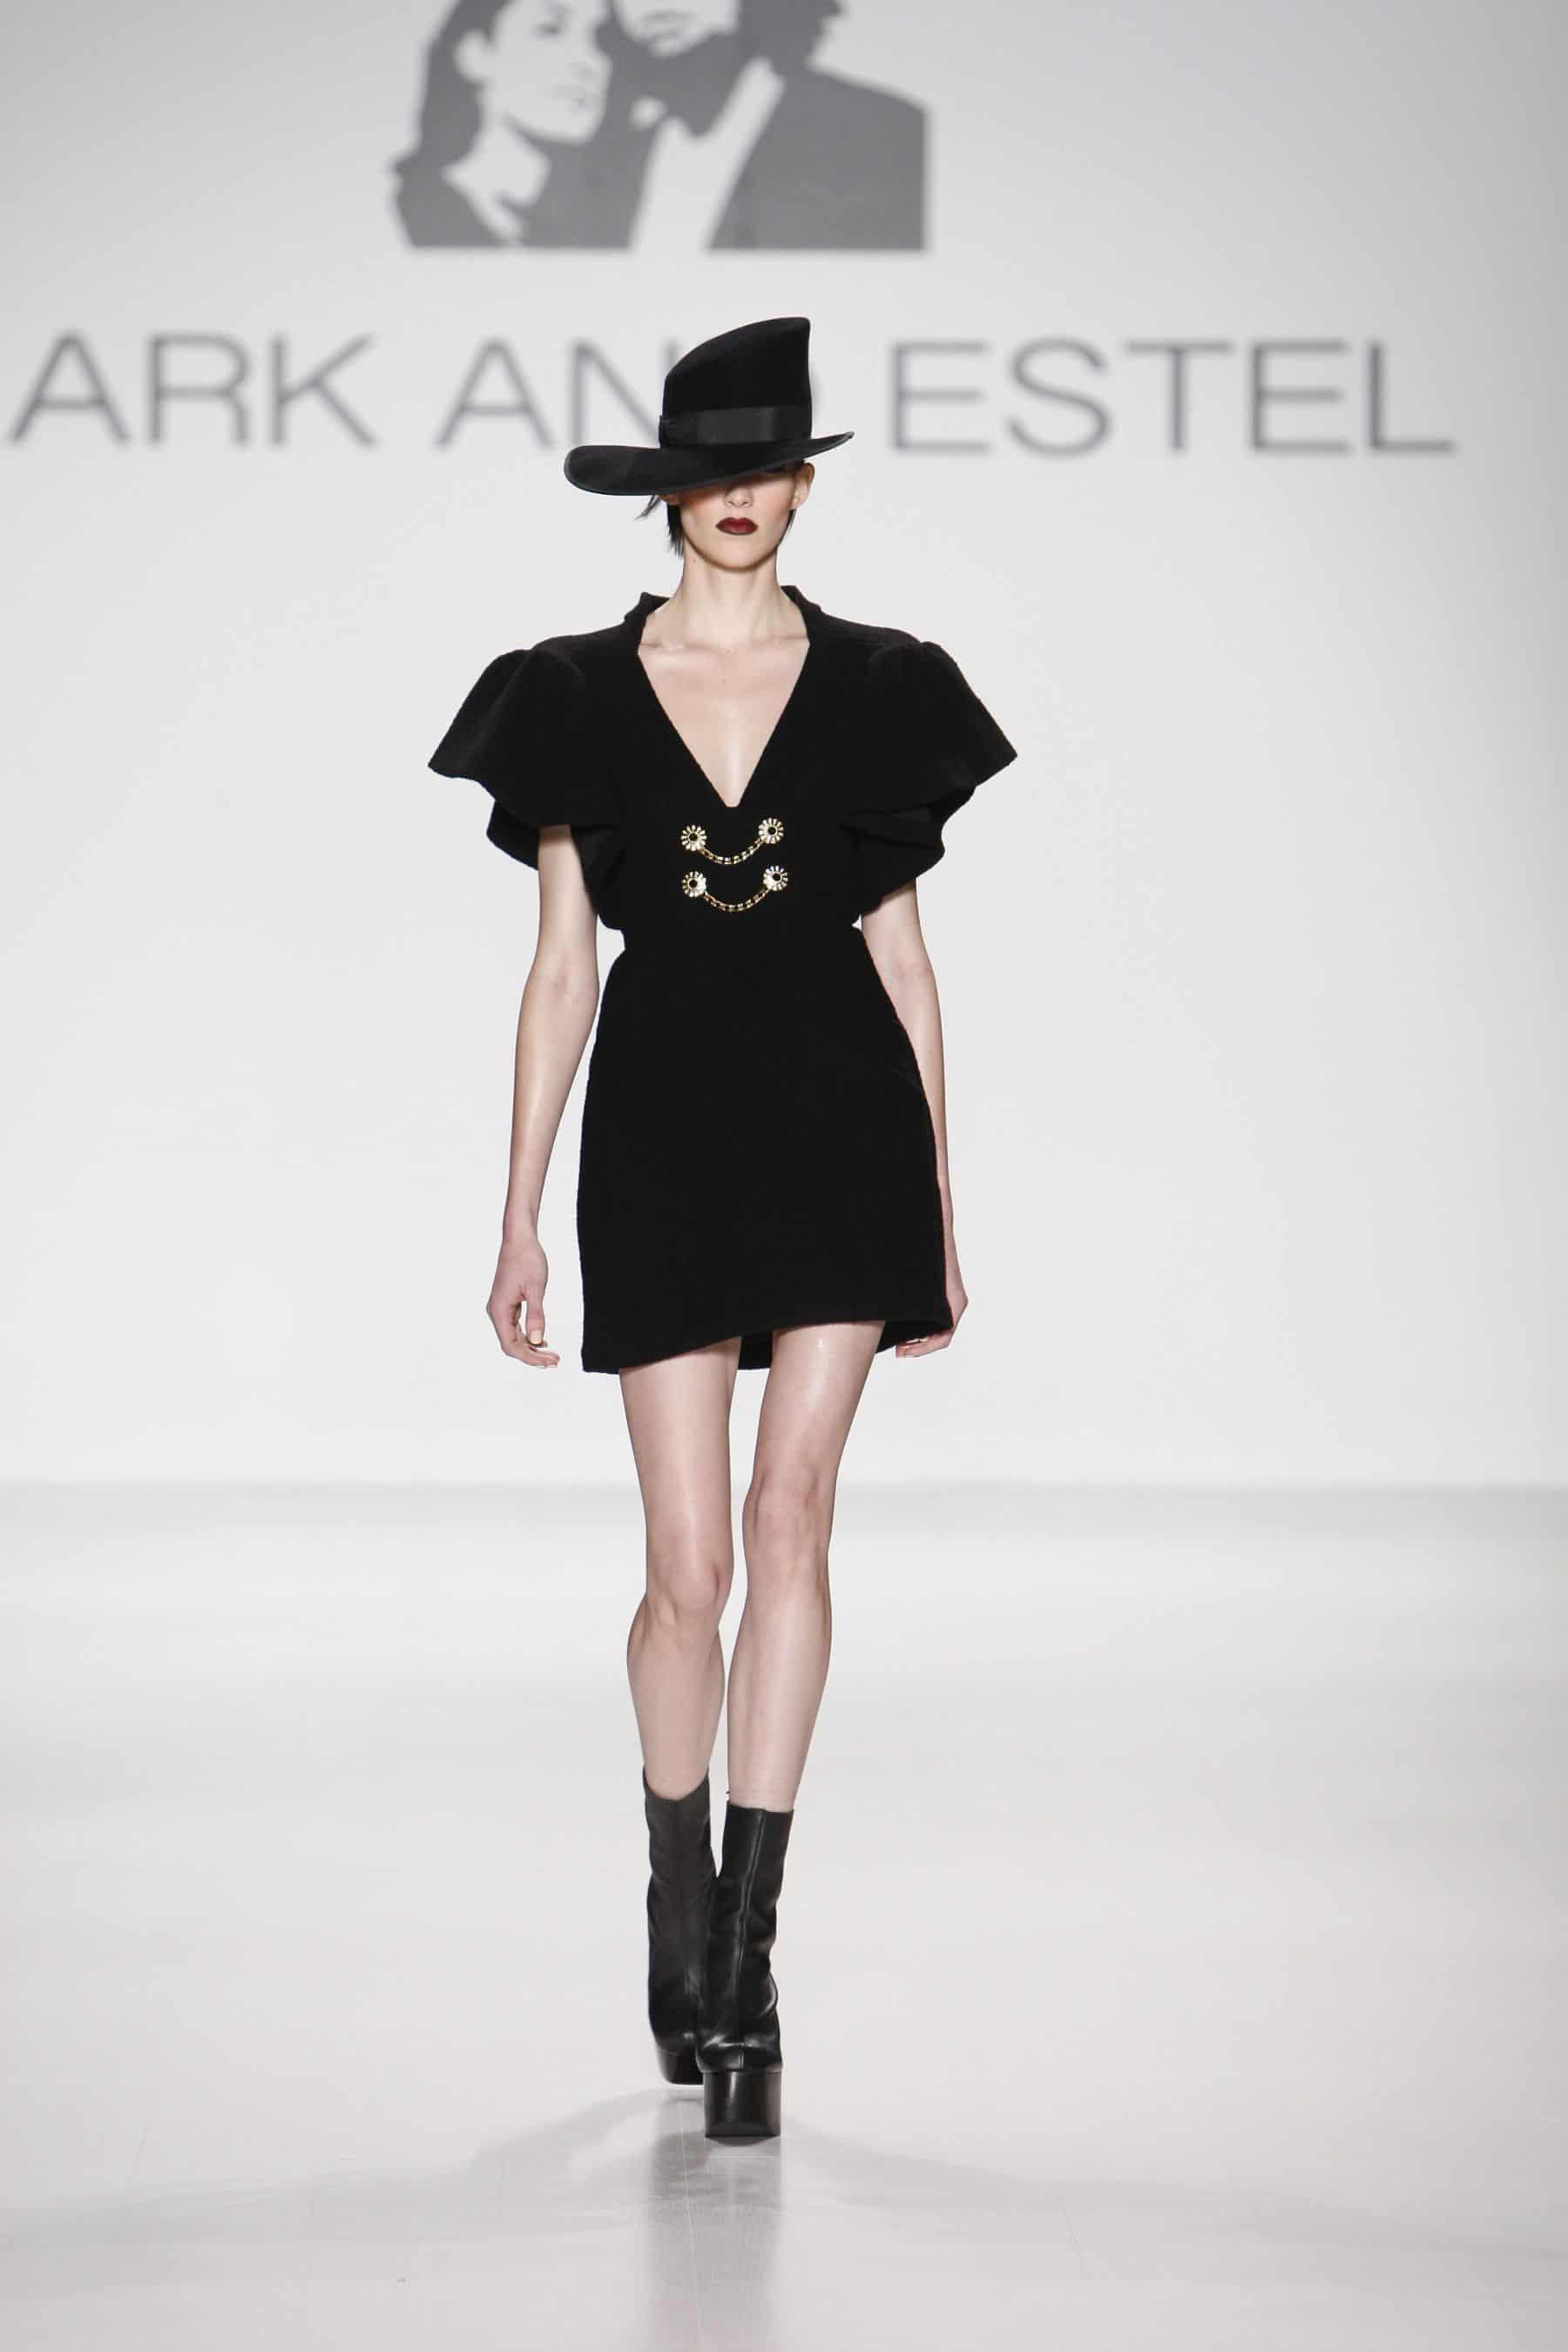 Fashion World: Mark and Estel